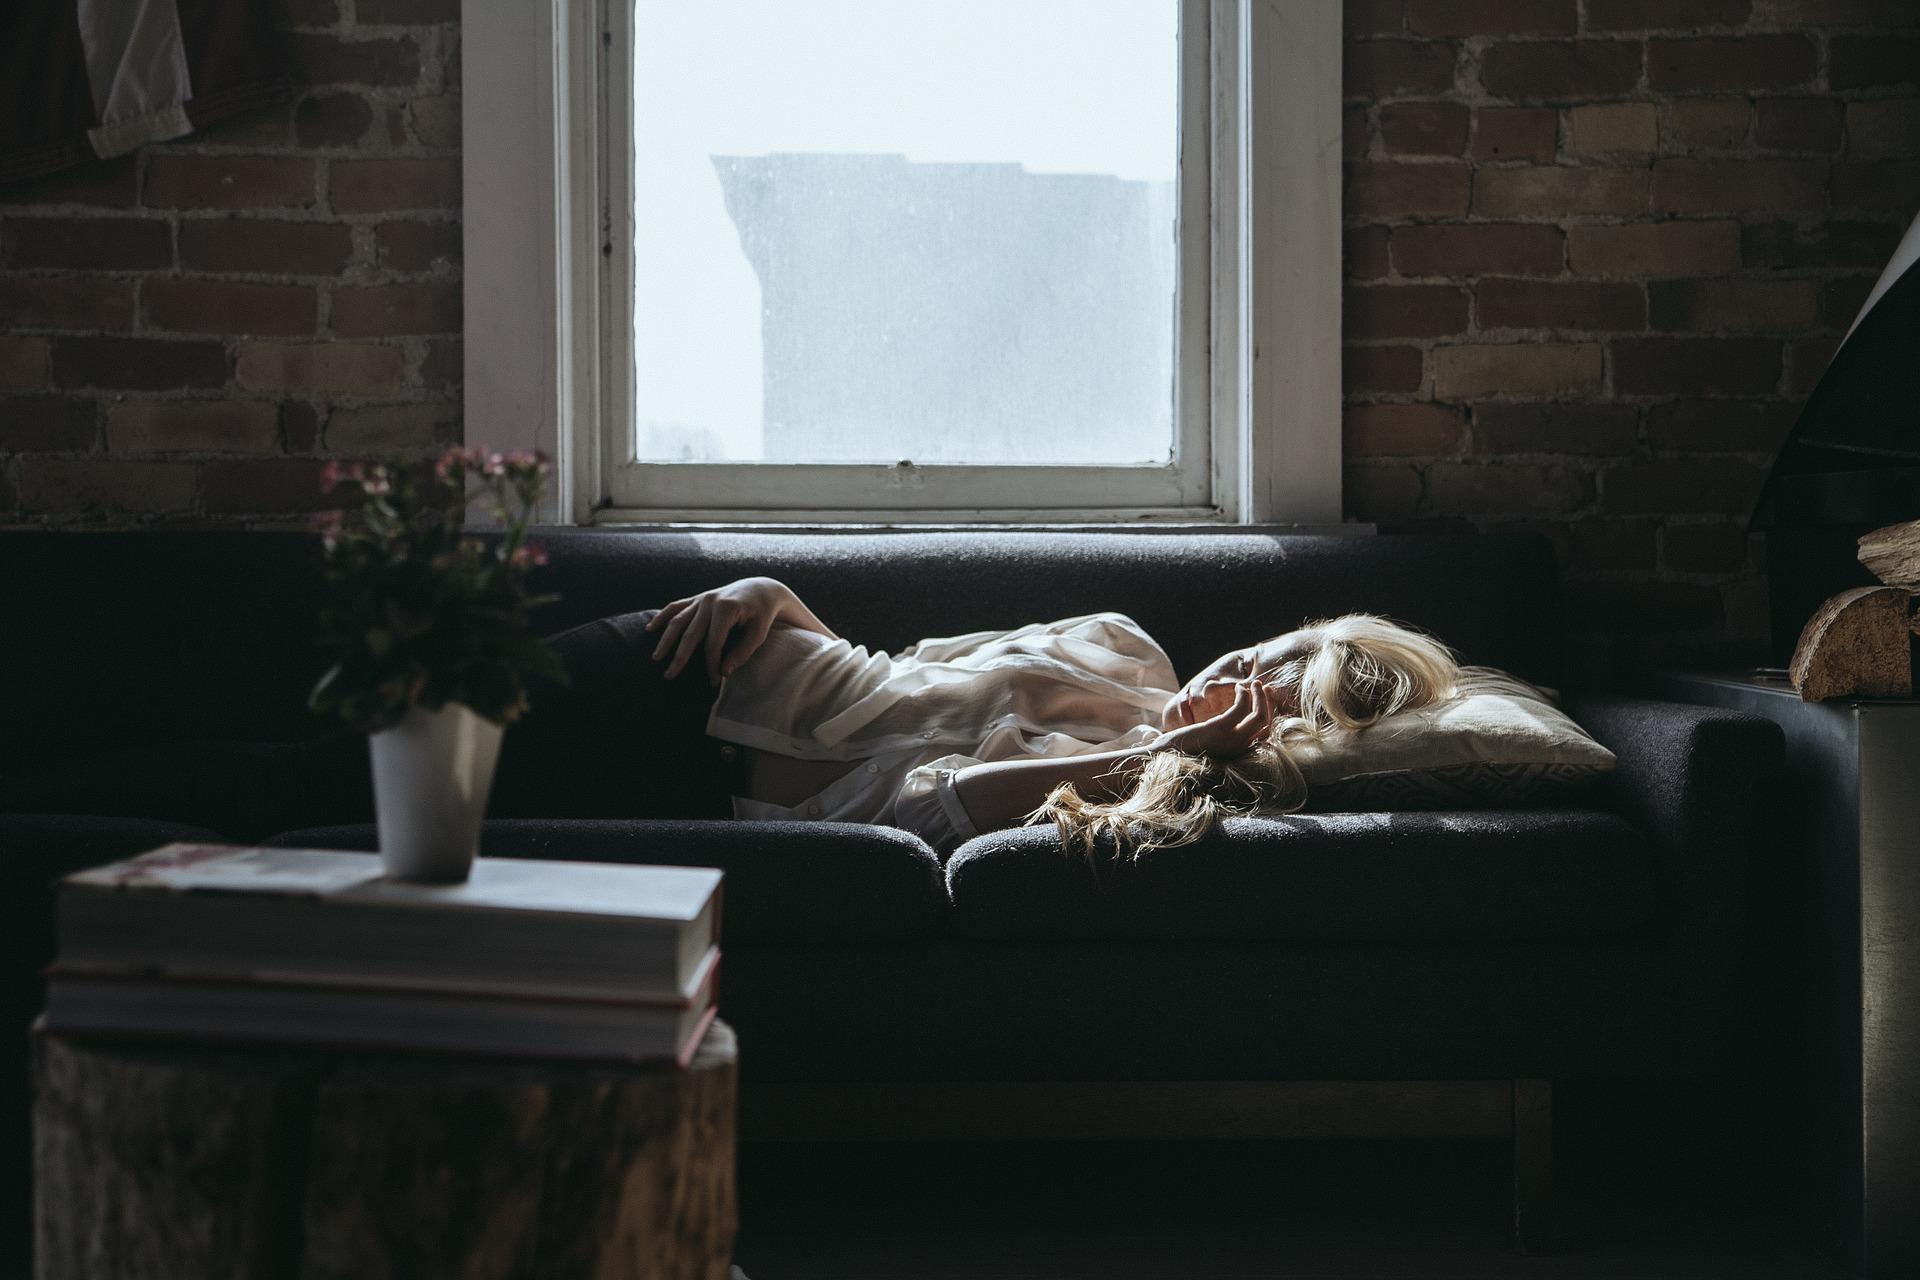 couchsurf. Alternative accommodation.